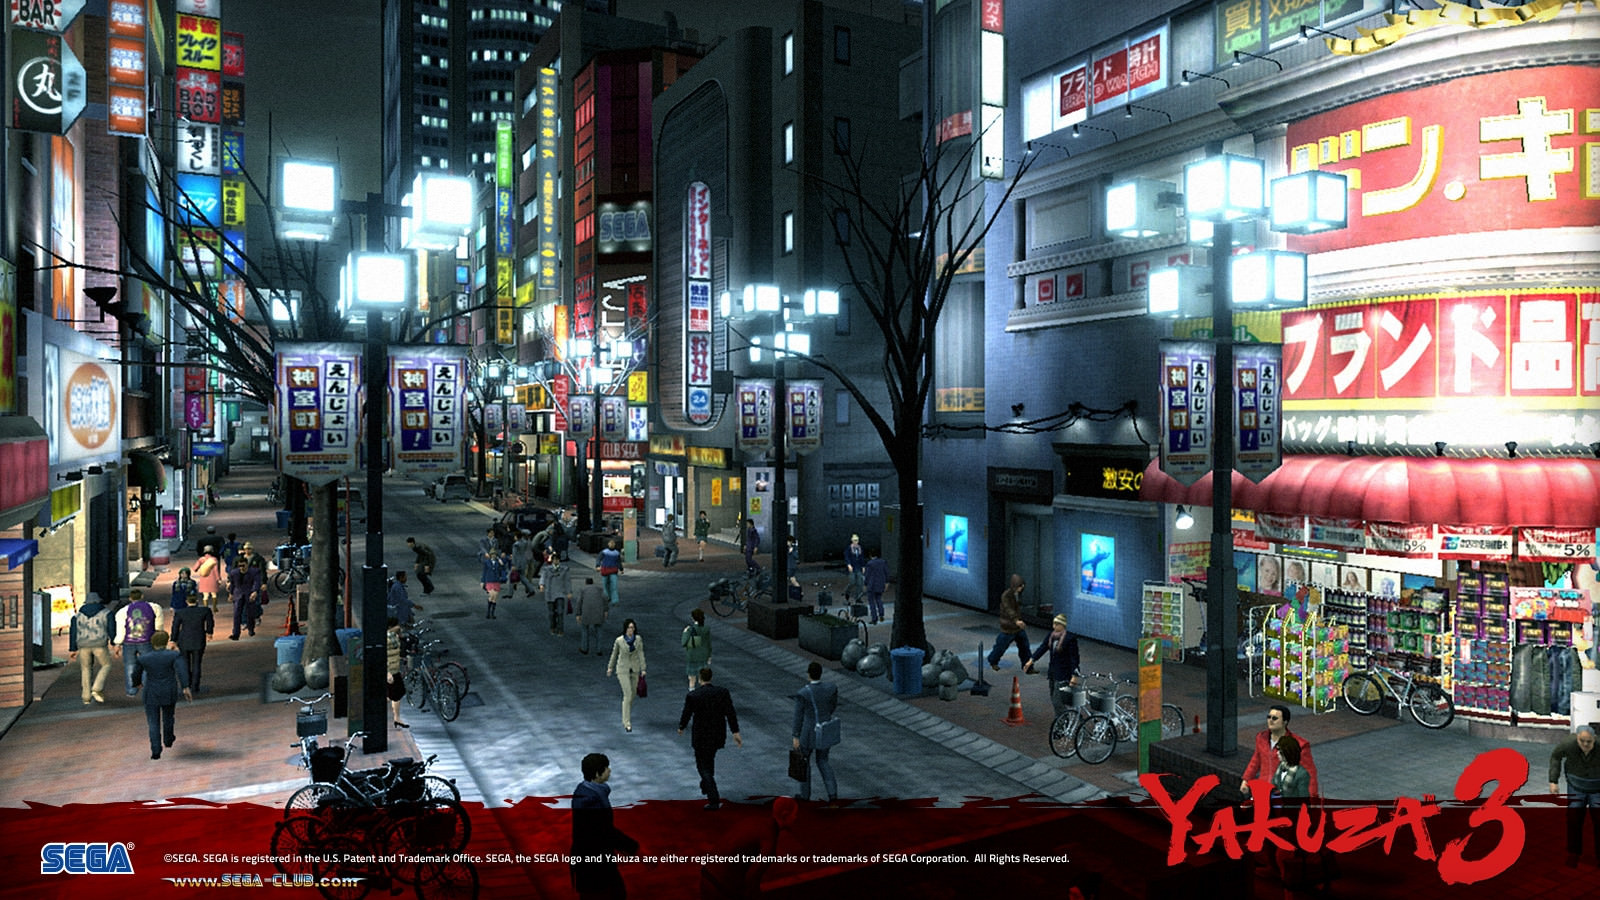 Yakuza 3 Wallpapers   Top Yakuza 3 Backgrounds   WallpaperAccess 1600x900